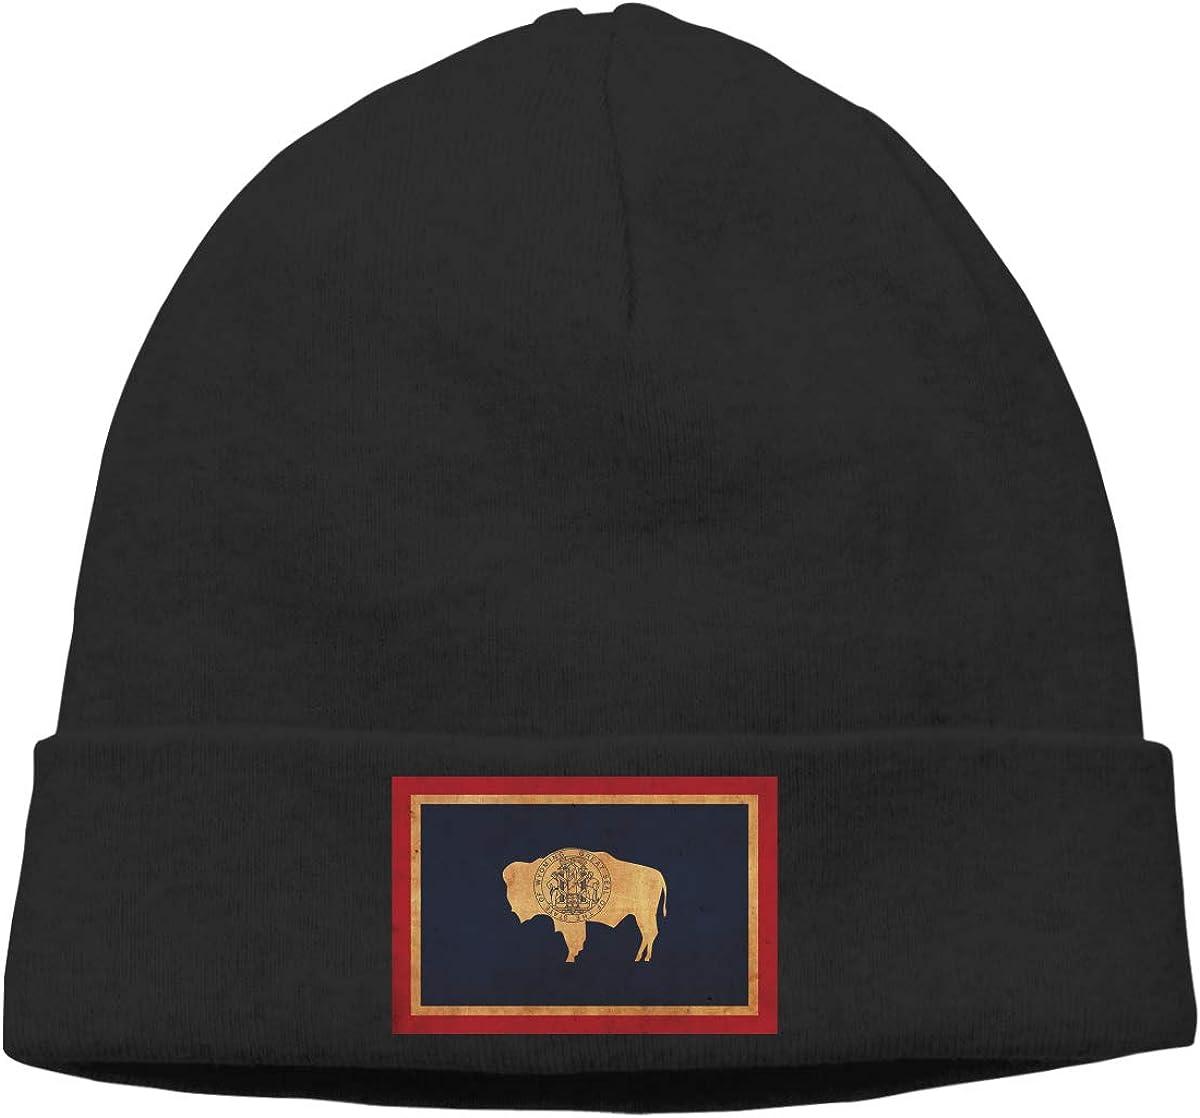 Vintage Wyoming Flag Beanie Hats Cap Men Winter Summer Serious Style Skull Cap Winter Hats